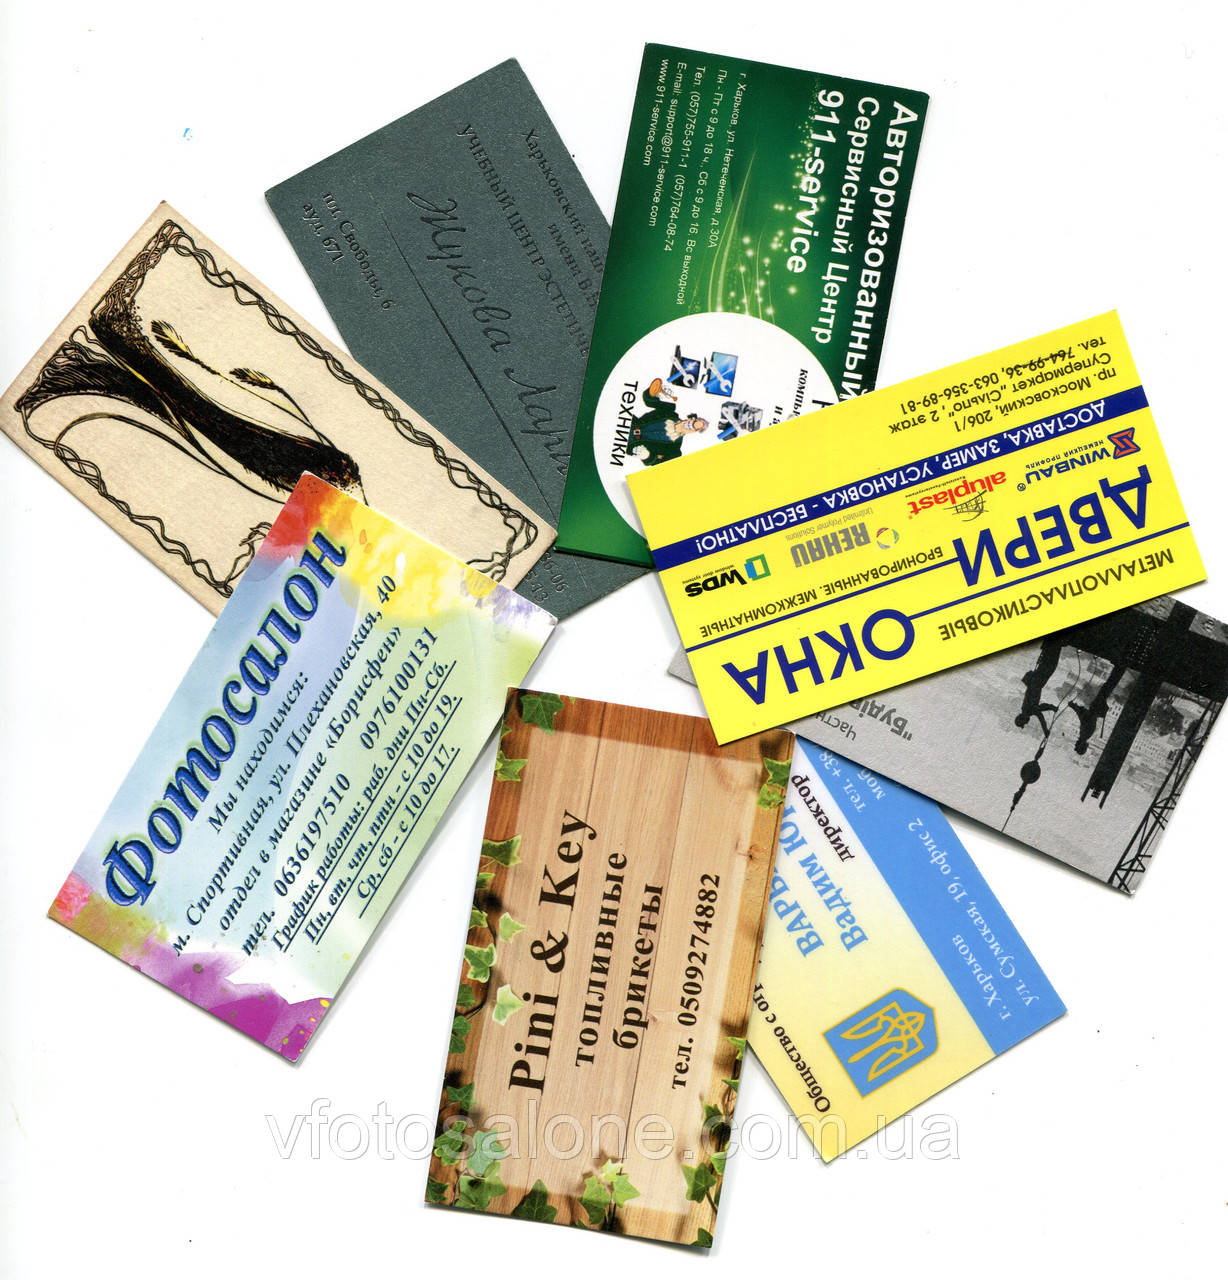 дизайн визитки екатеринбург